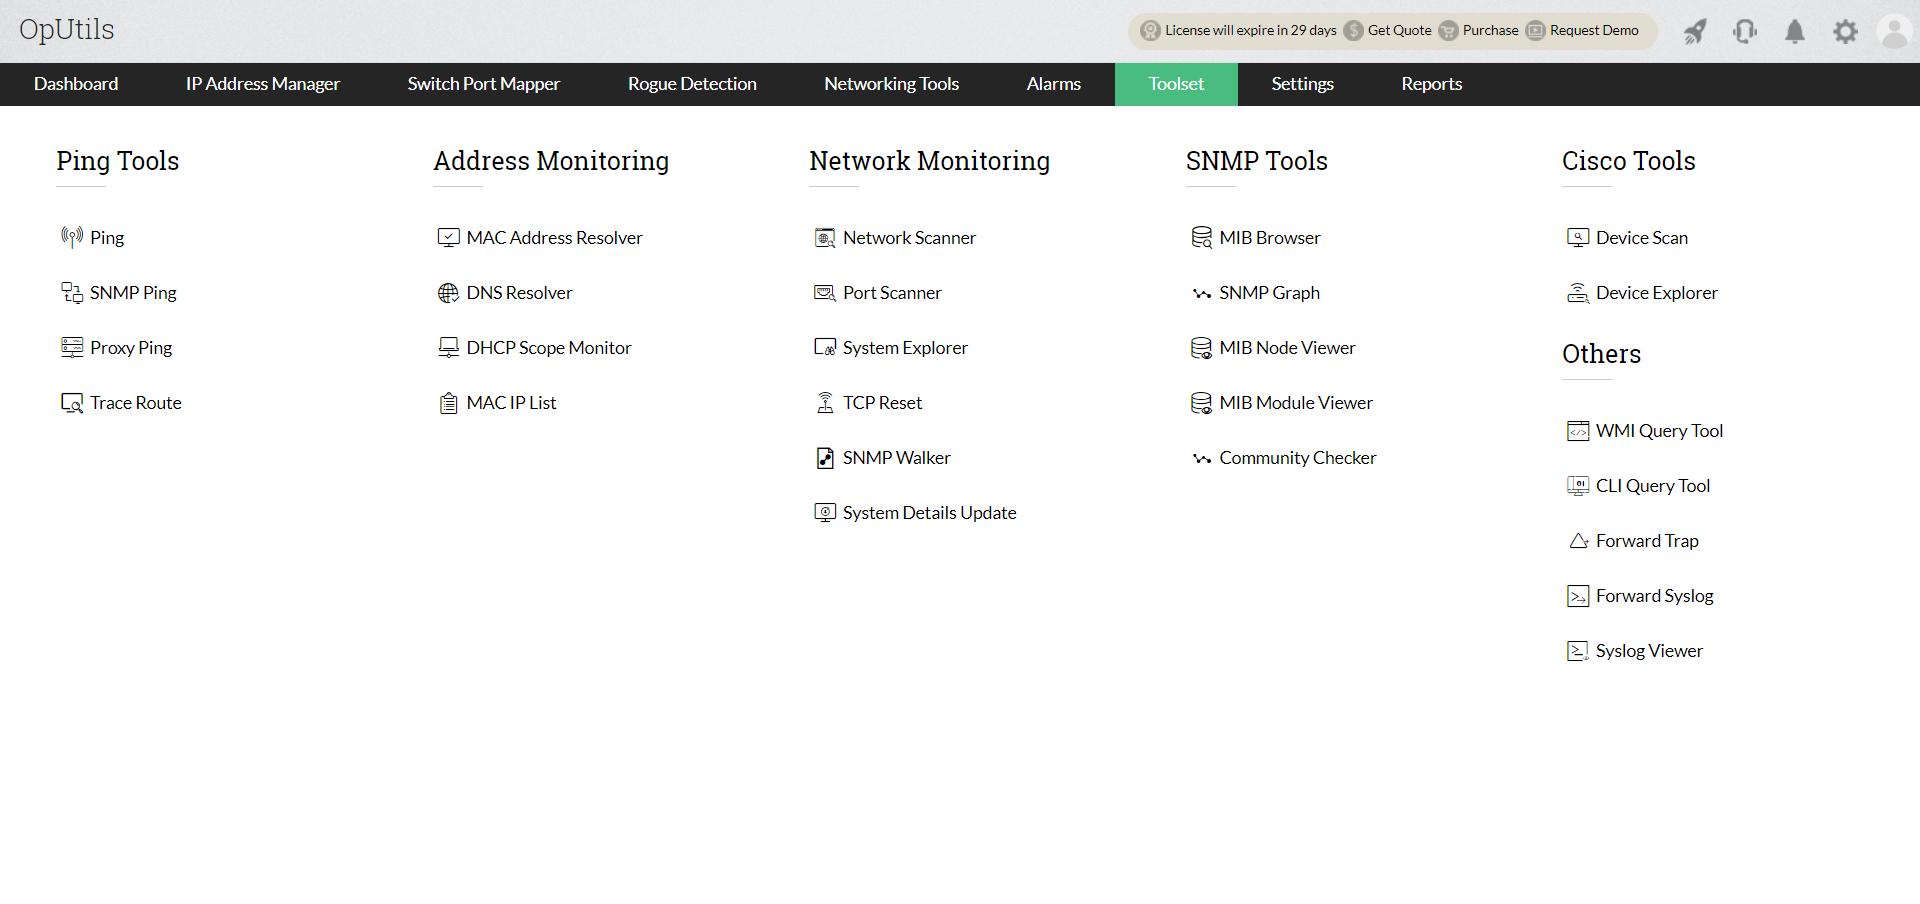 Nätverksverktyg - ManageEngine Oputils